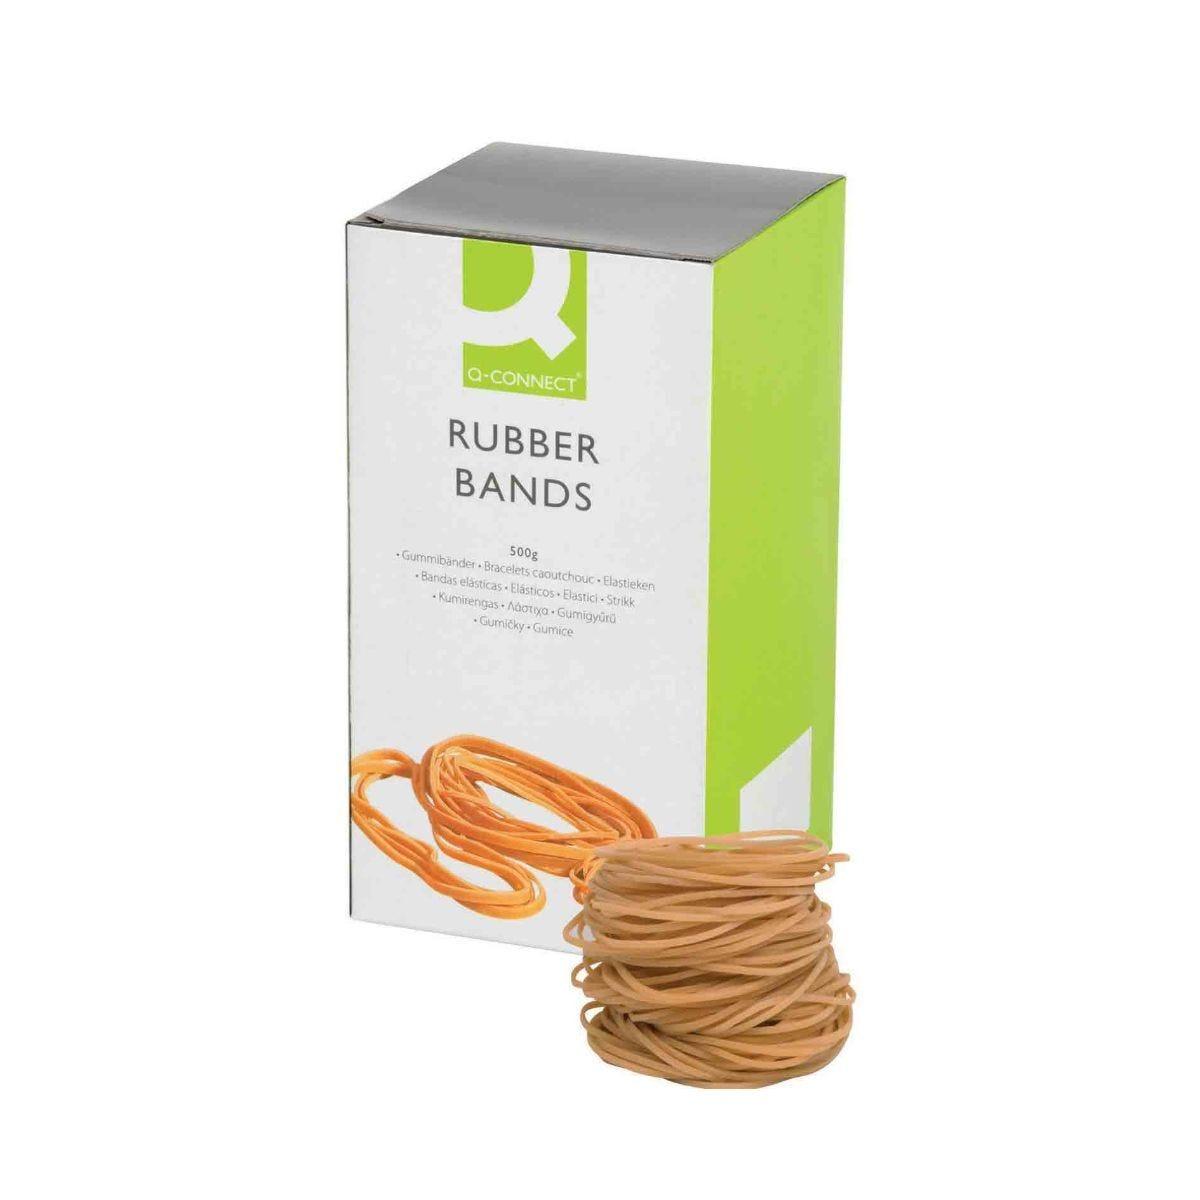 Q-Connect Rubber Bands No. 24 152.4 x 1.6mm 500g